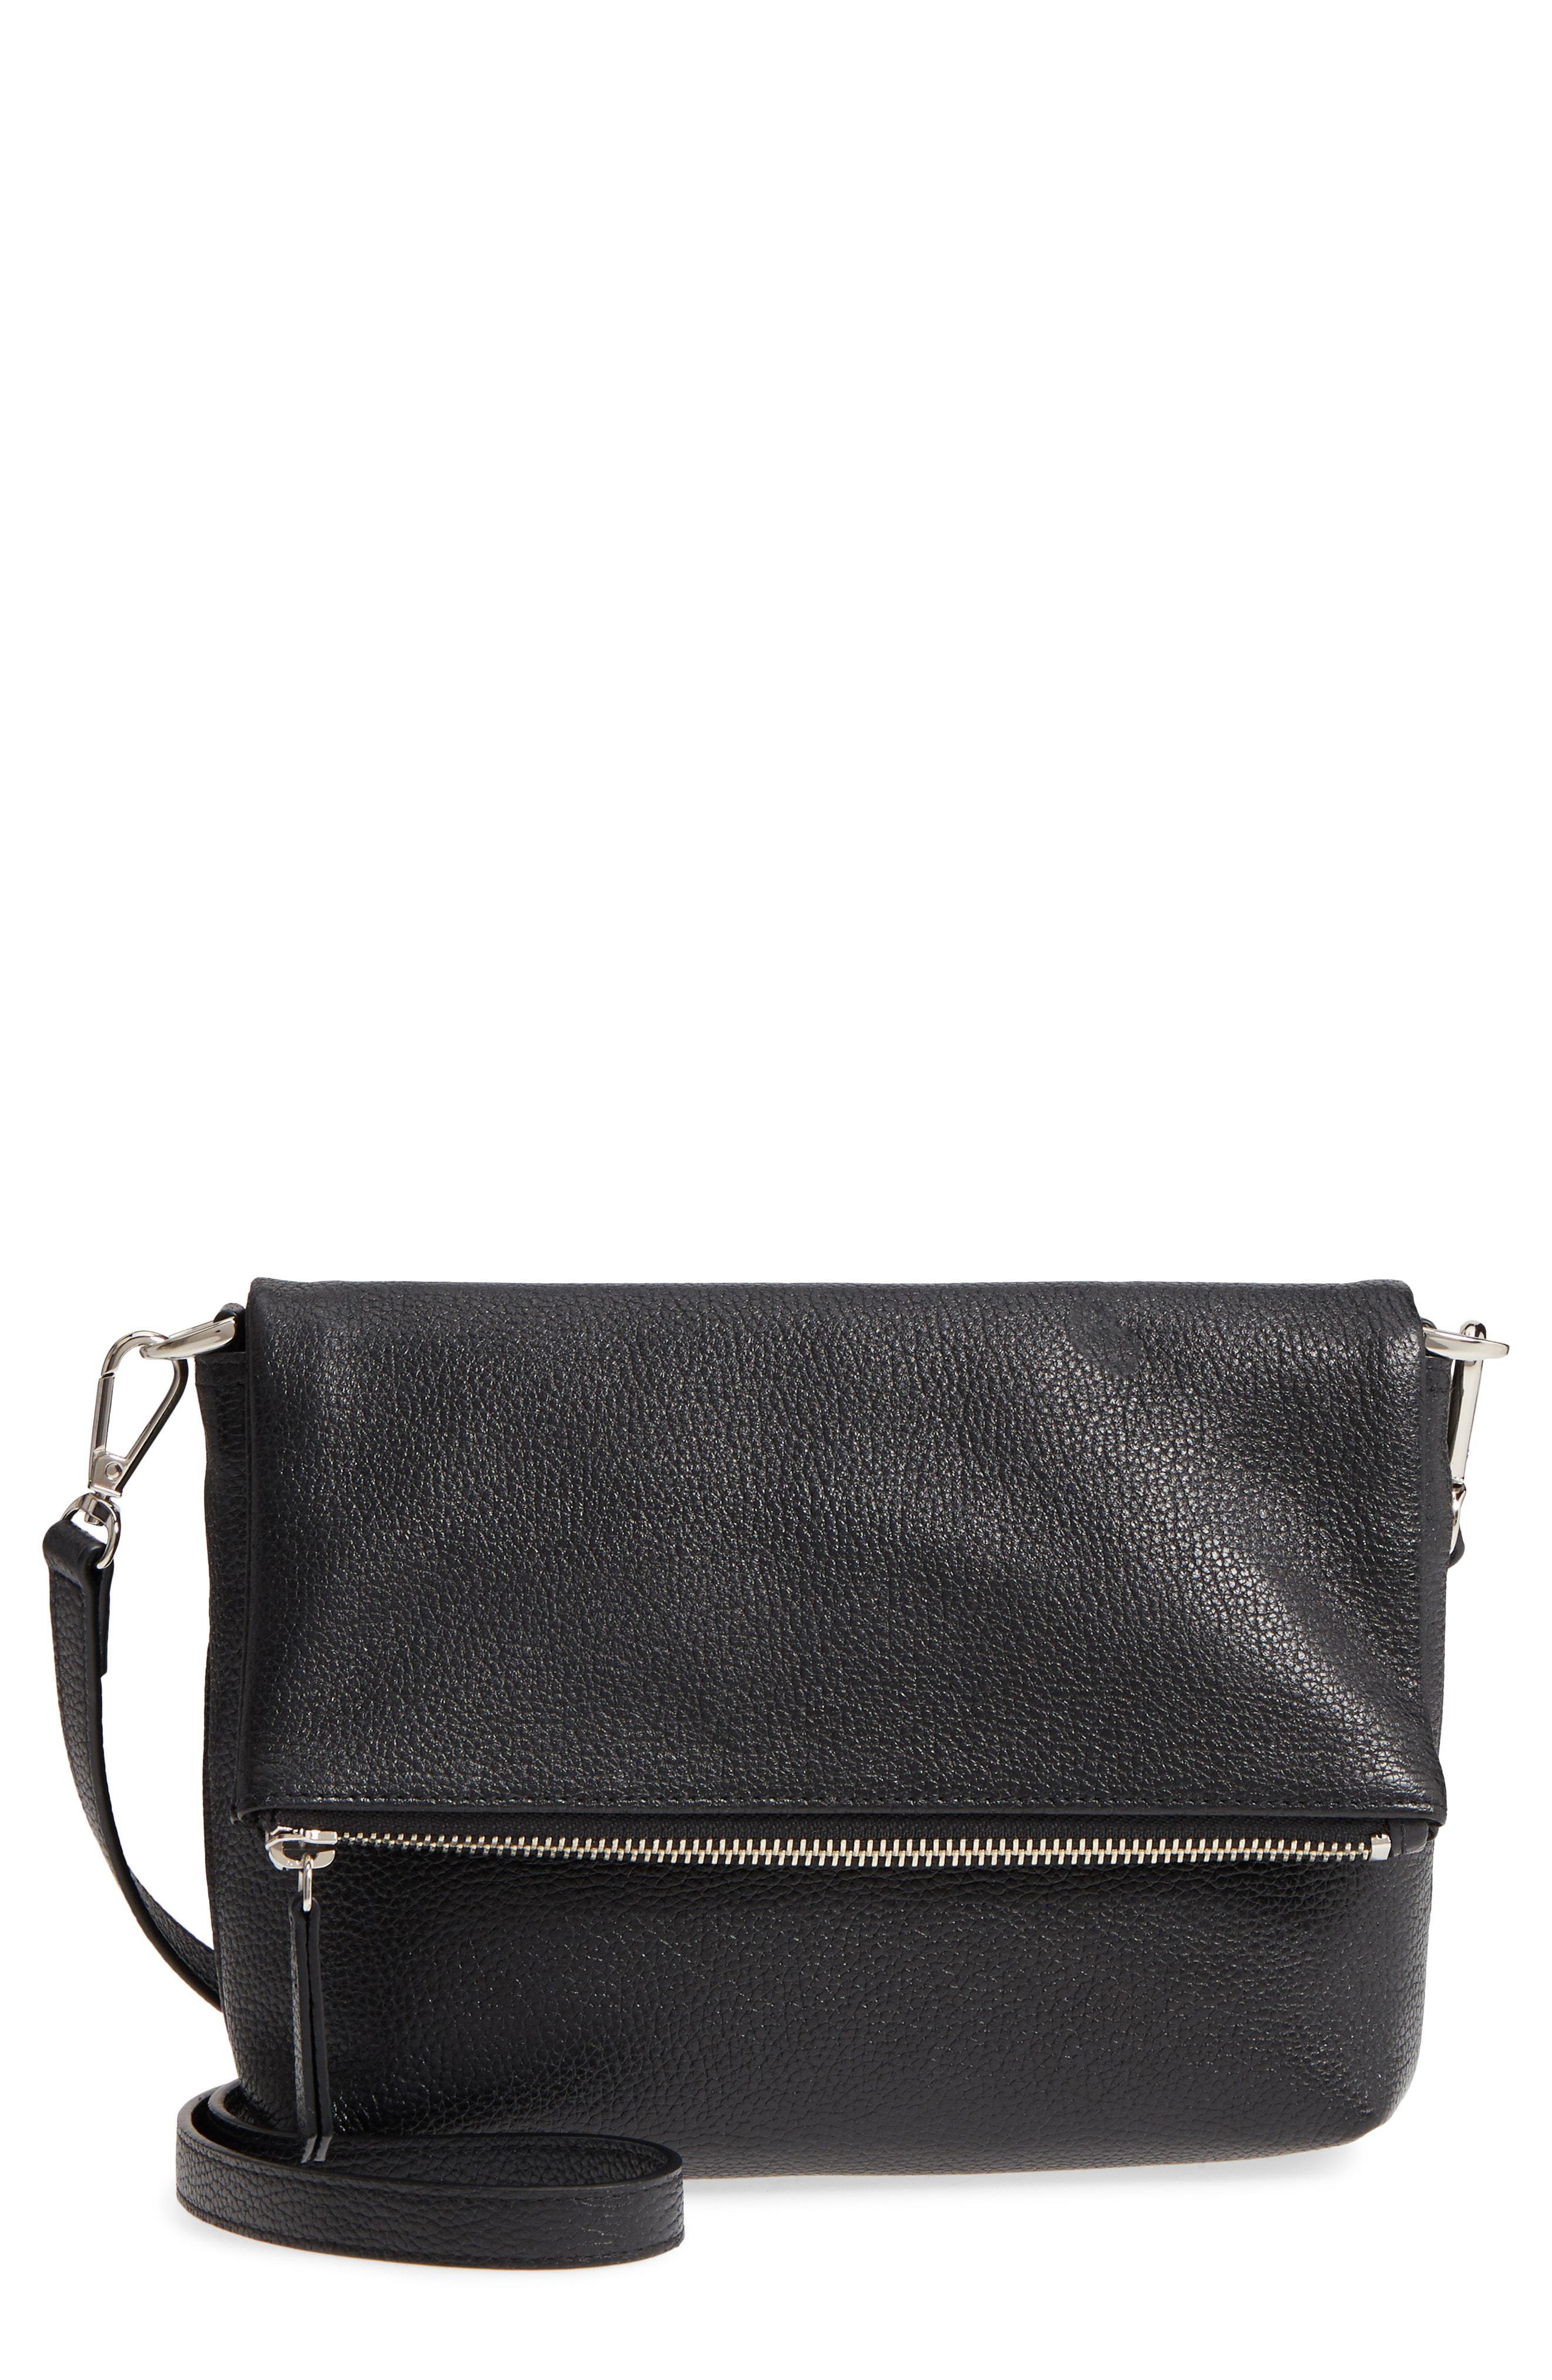 a0dd2a57452c Nordstrom. Women s Ava Foldover Crossbody Bag -